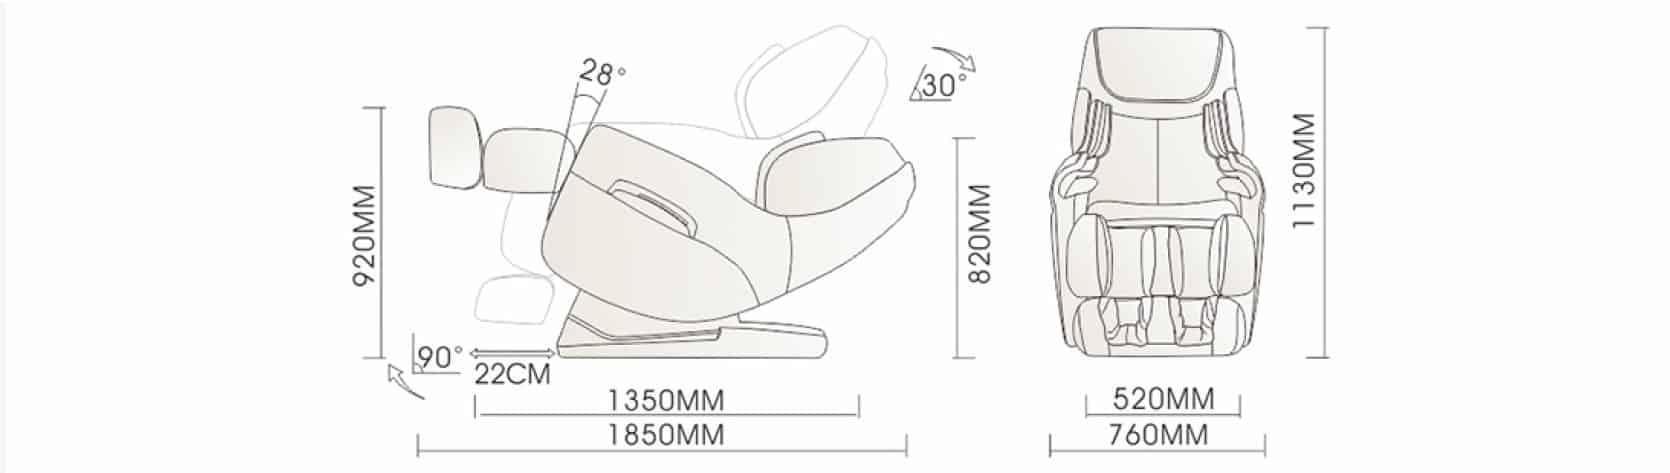 massage chair A380 iRest dimensions